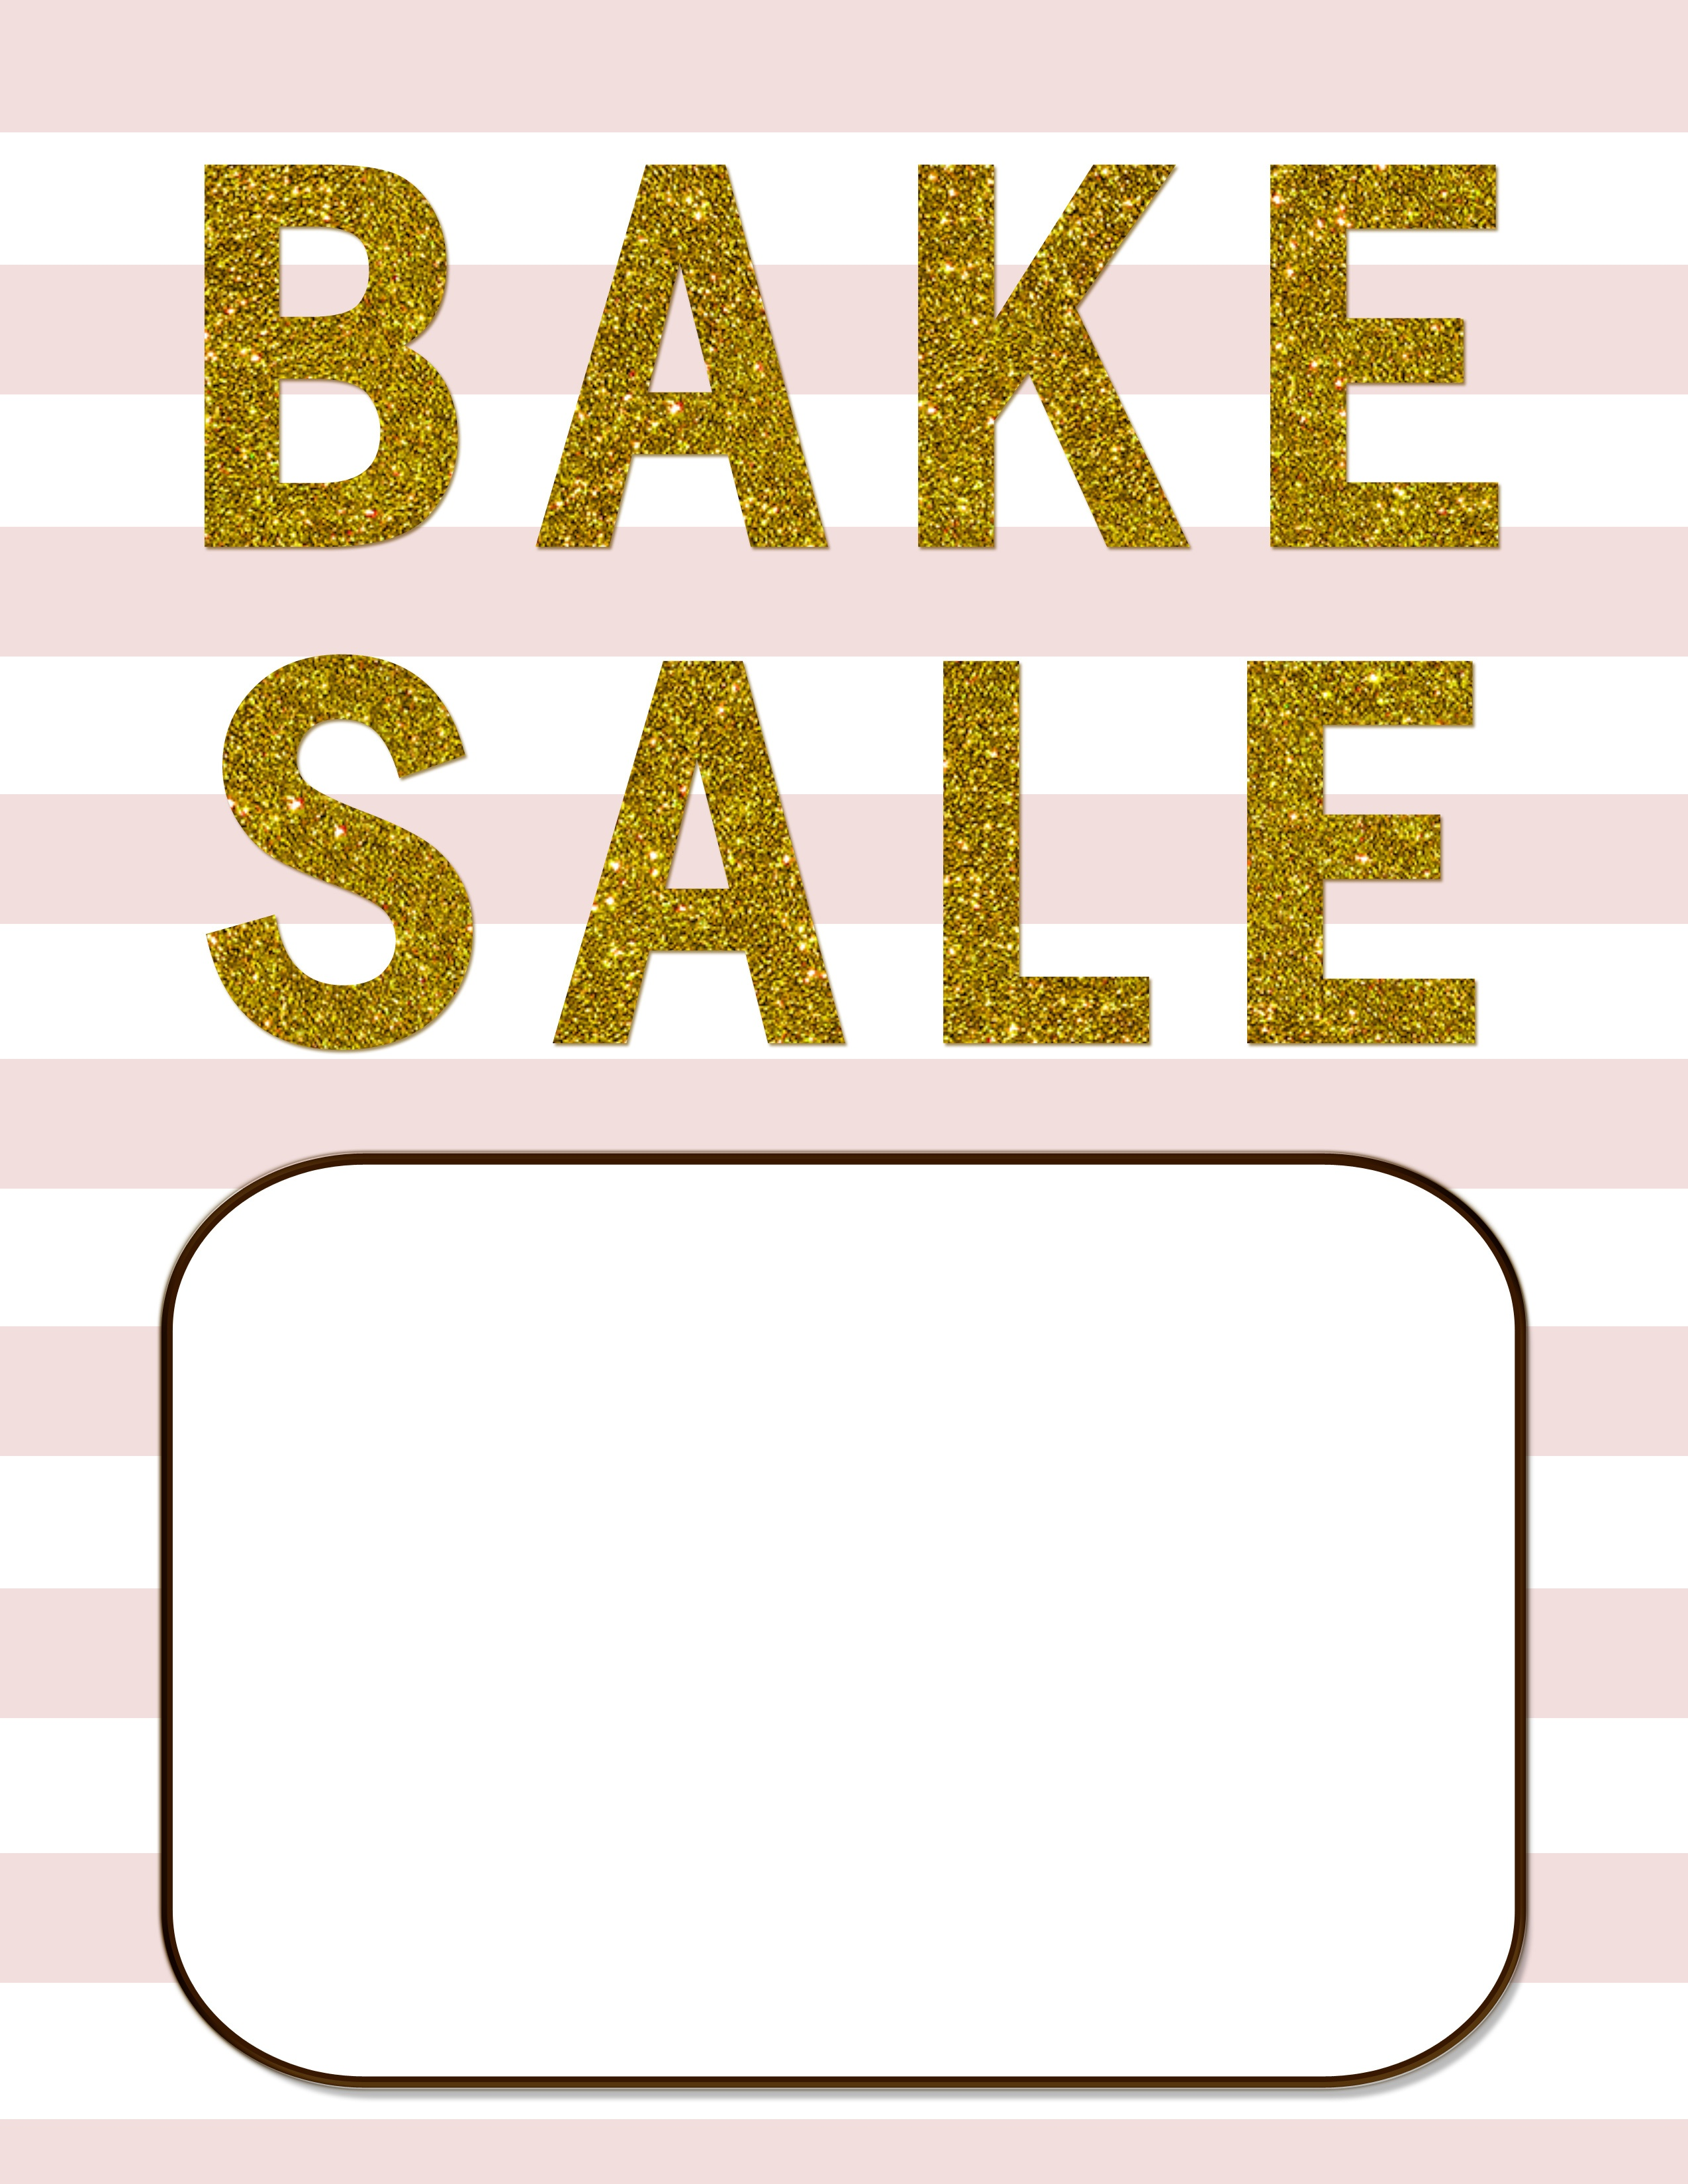 Bake Sale Flyers – Free Flyer Designs - Free Printable Flyers